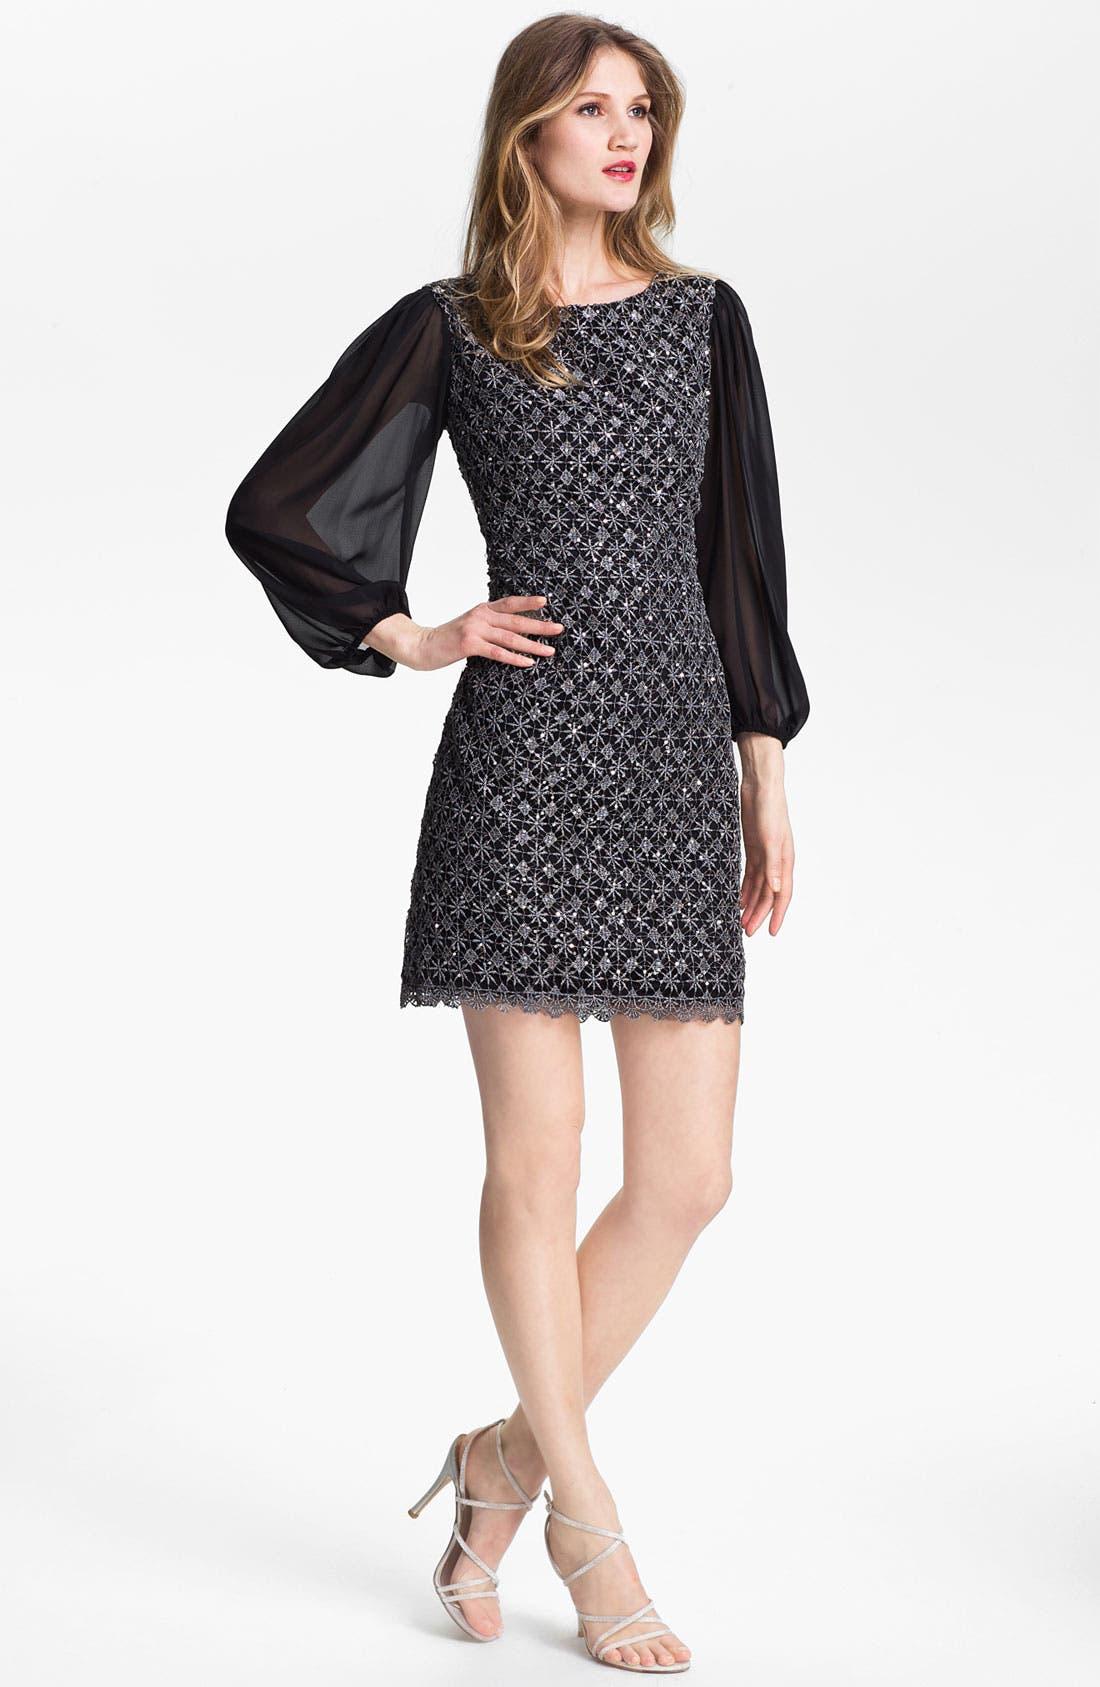 Alternate Image 1 Selected - Patra Metallic Lace Sheath Dress (Petite)